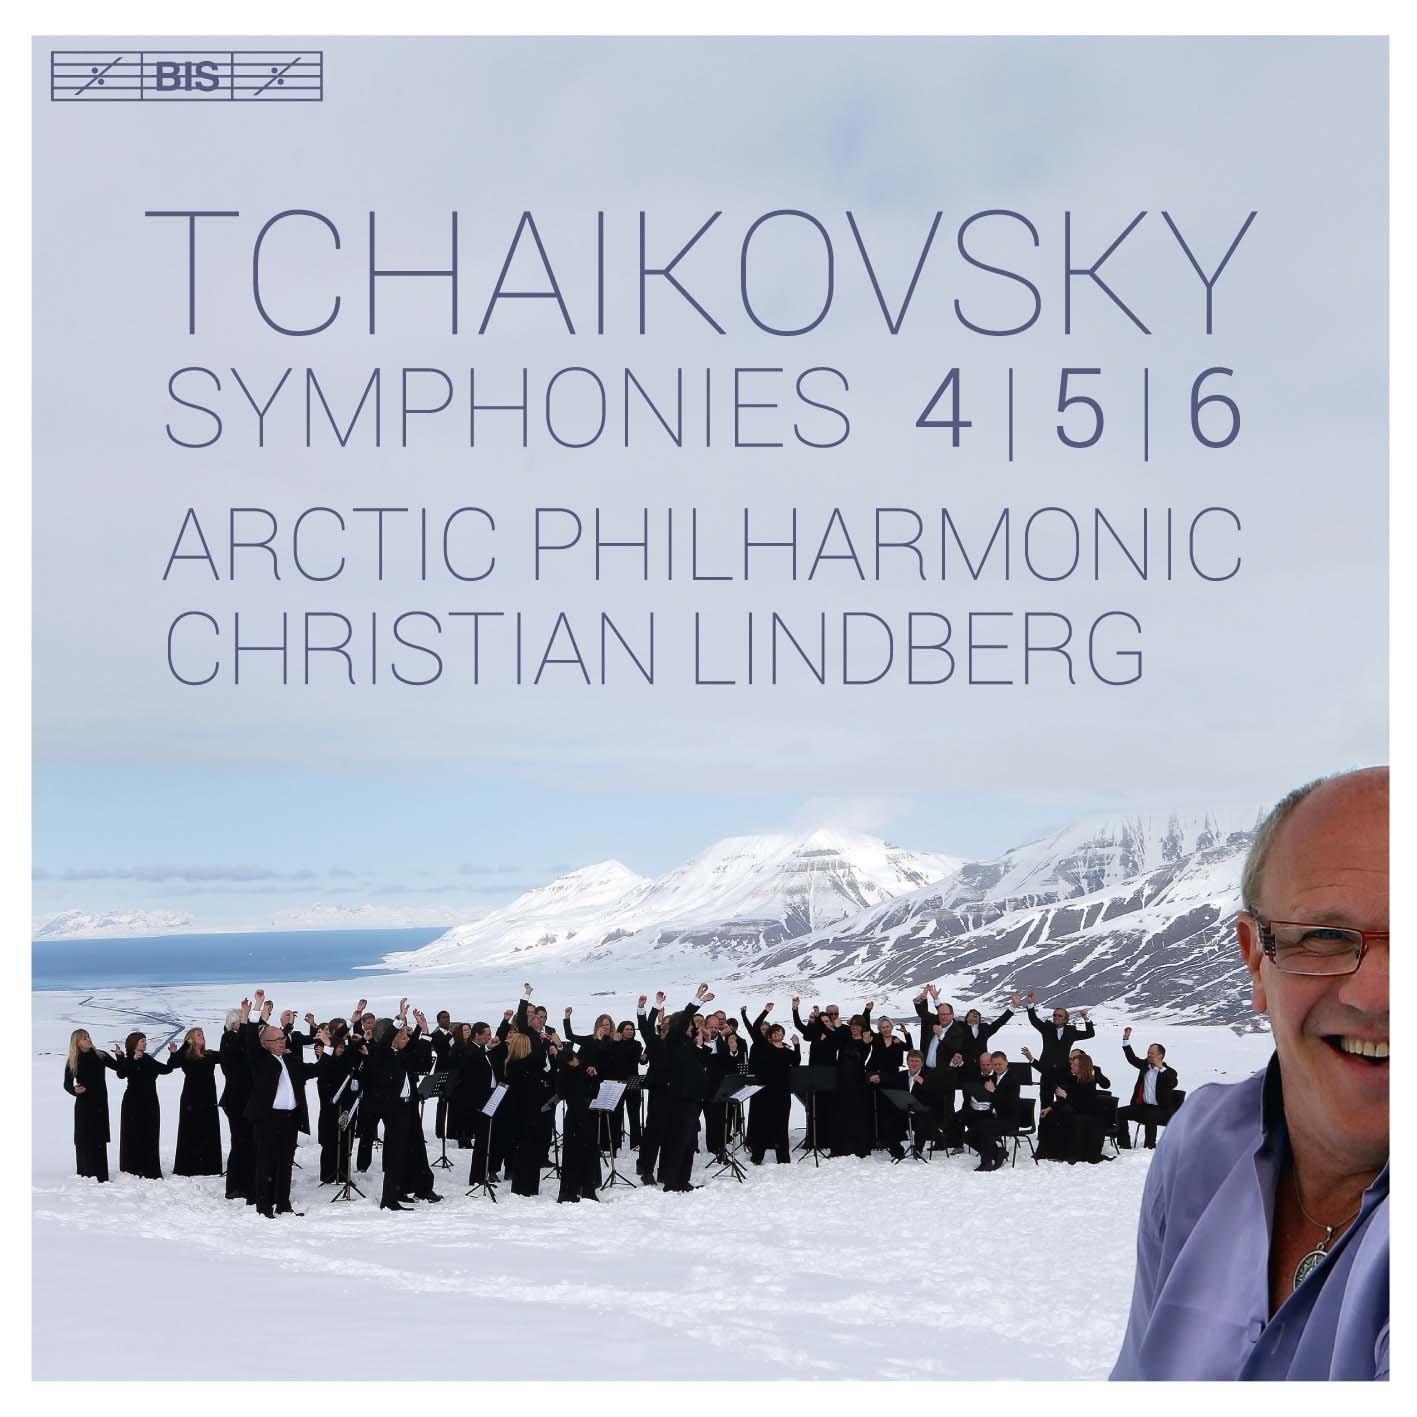 SACD : Tchaikovsky / Arctic Philharmonic / Lindberg - Pyotr Ilyich Tchaikovsky: Symphonies Nos 4-6 (Hybrid SACD)